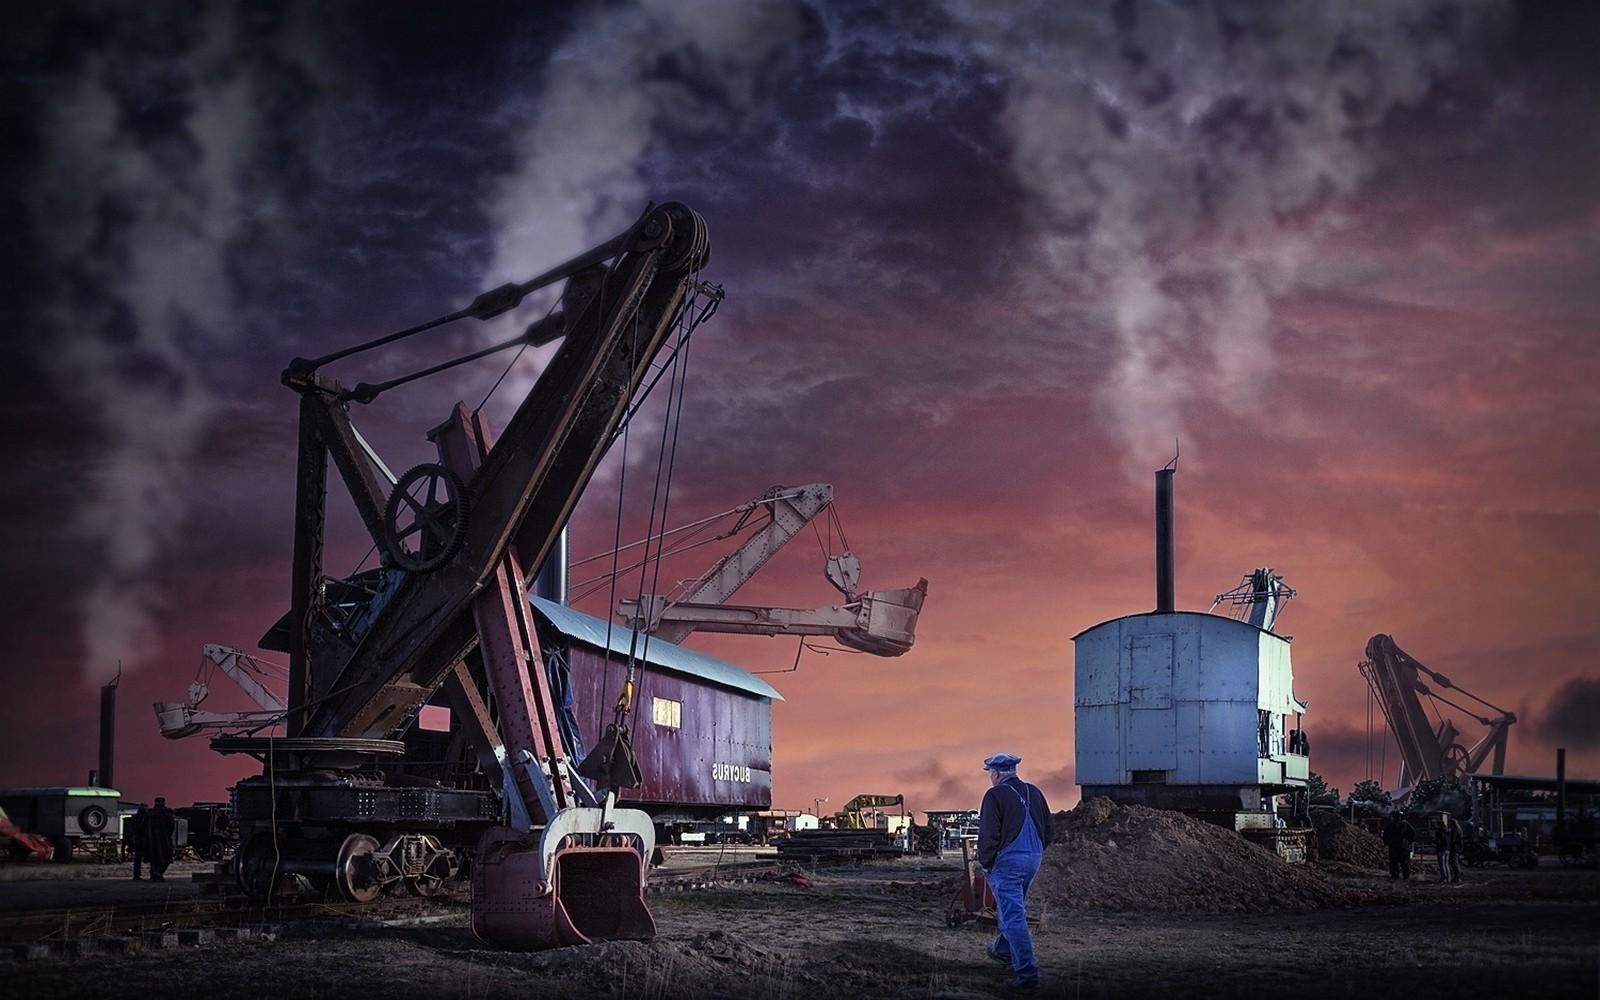 Cool Wallpaper Night Evening - 1600x1000_px_Engineering_landscape_Machine_Pollution_Shovels_sunset_work-699750  Gallery-662332.jpg!d